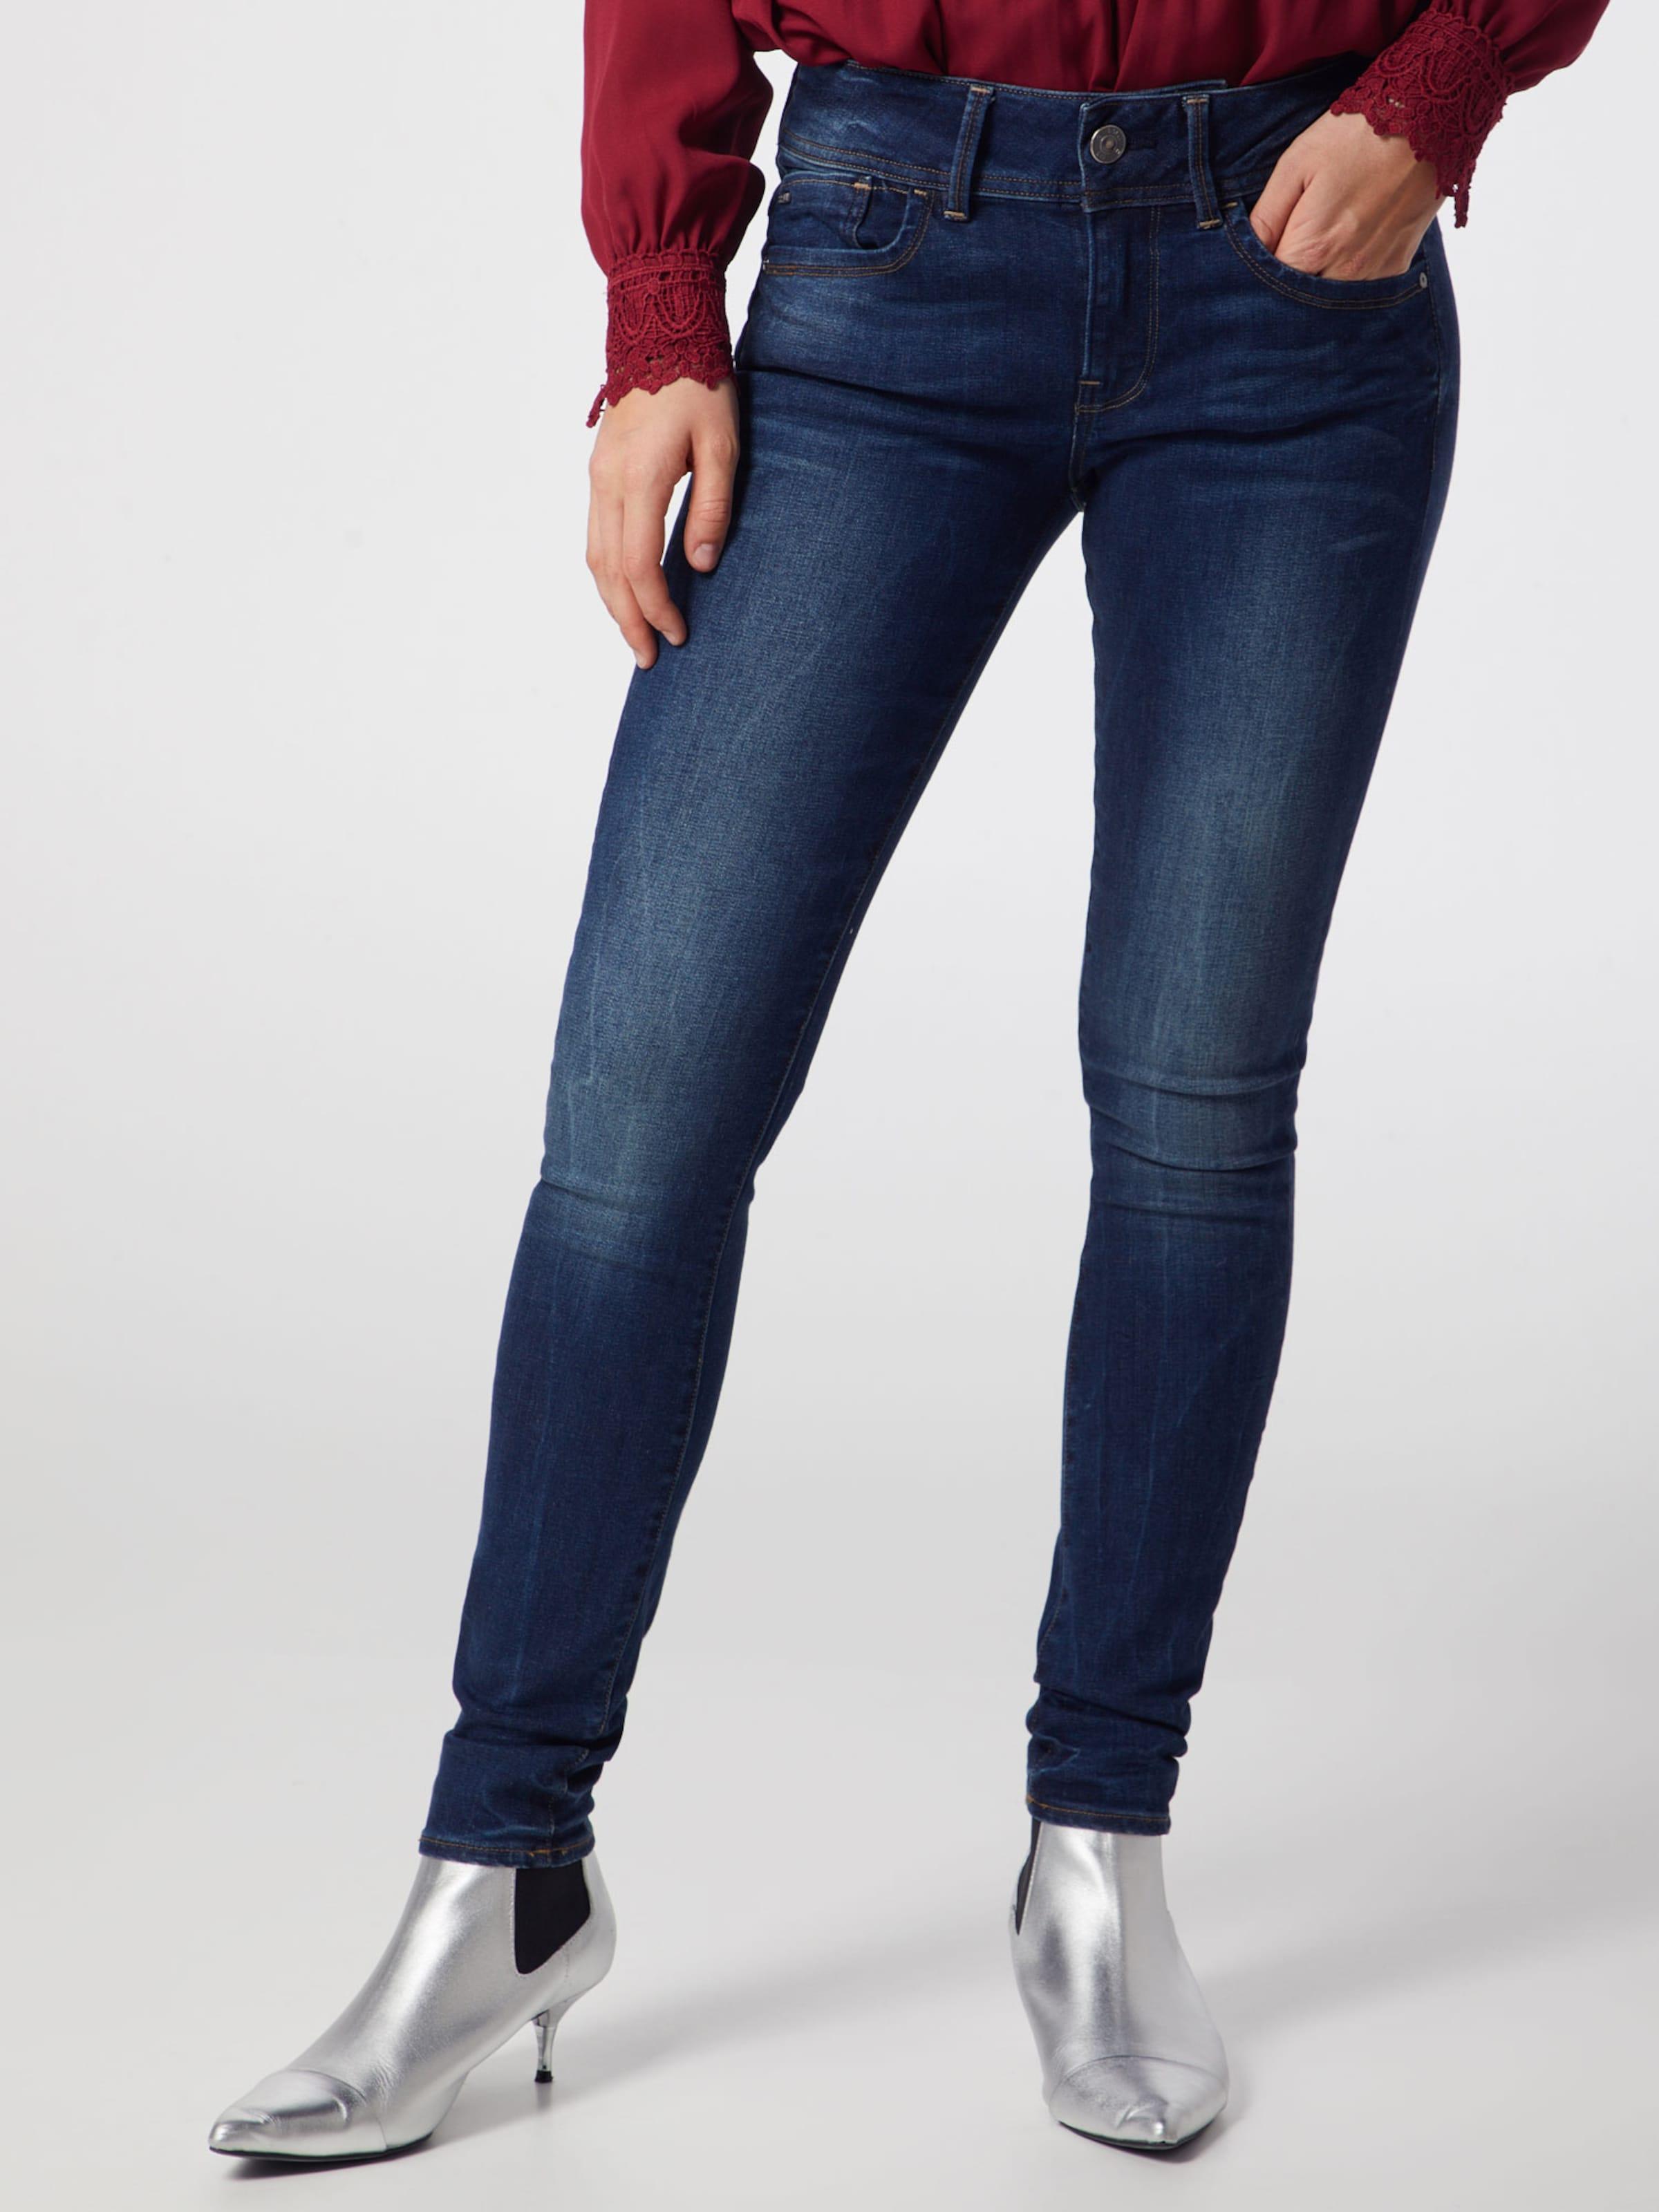 Raw Jeans star Denim G In 'lynn' Blue 3KJlFuT1c